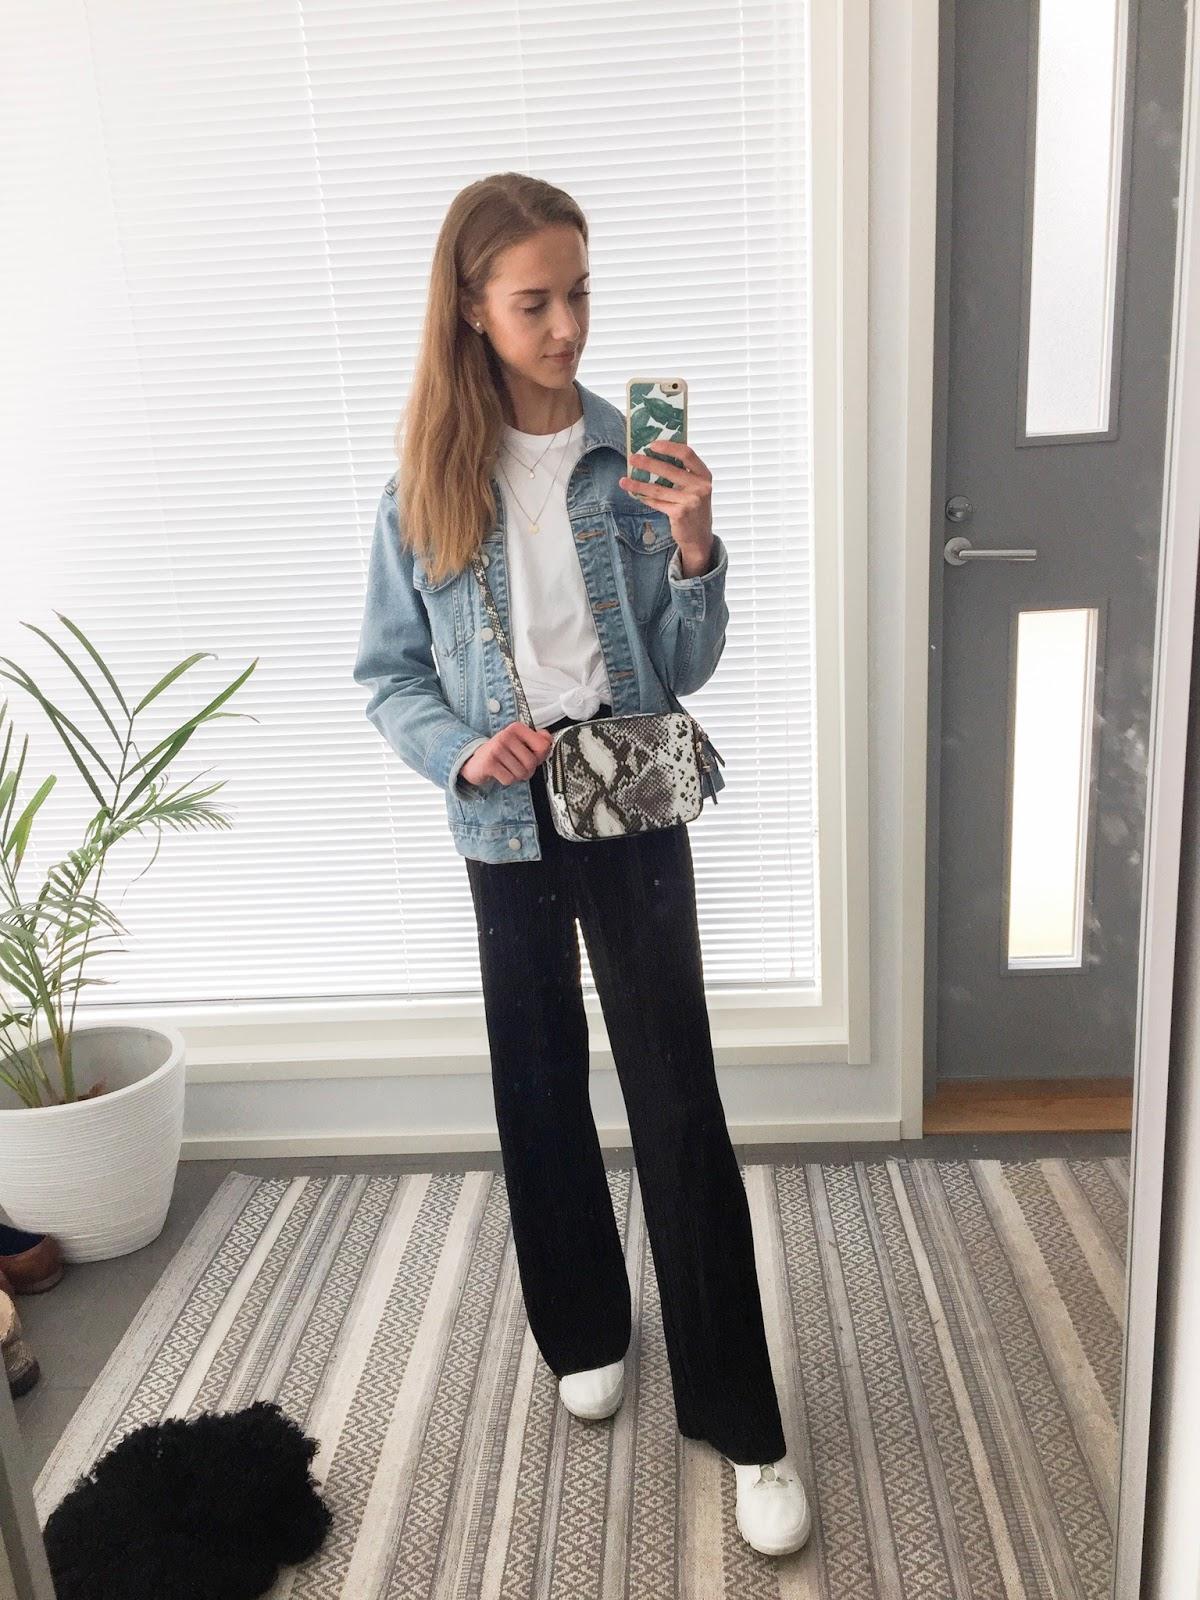 fashion-blogger-real-outfit-casual-flowy-trousers-denim-jacket-muotibloggaaja-arkiasu-liehuhousust-farkkutakki